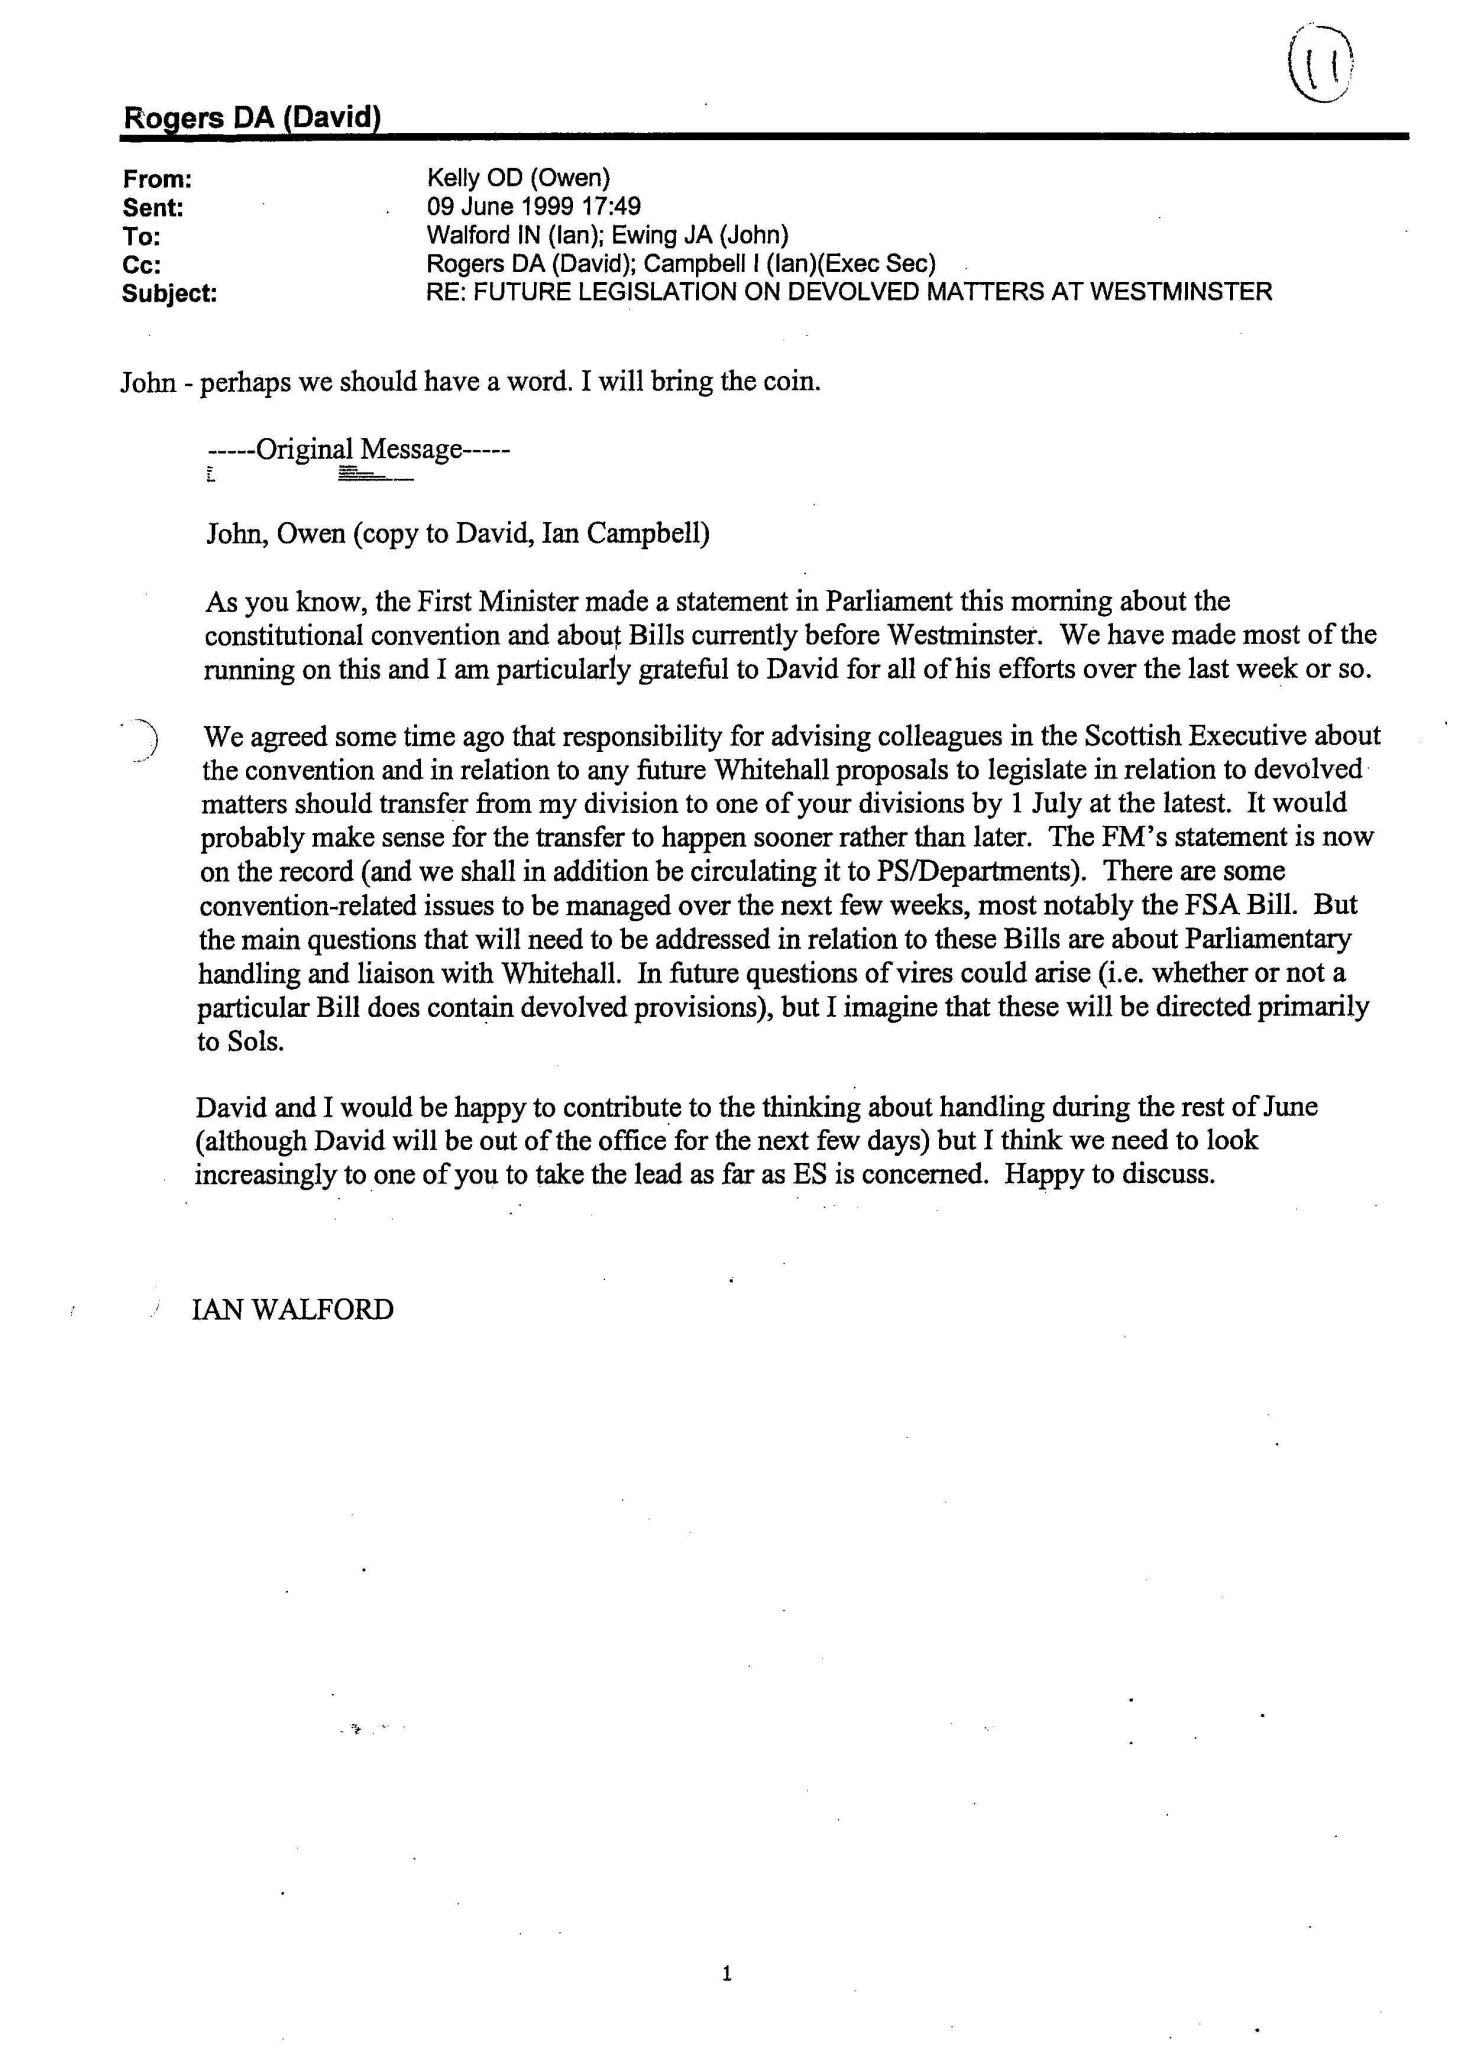 Worksheet The Legislative Branch Answer Key